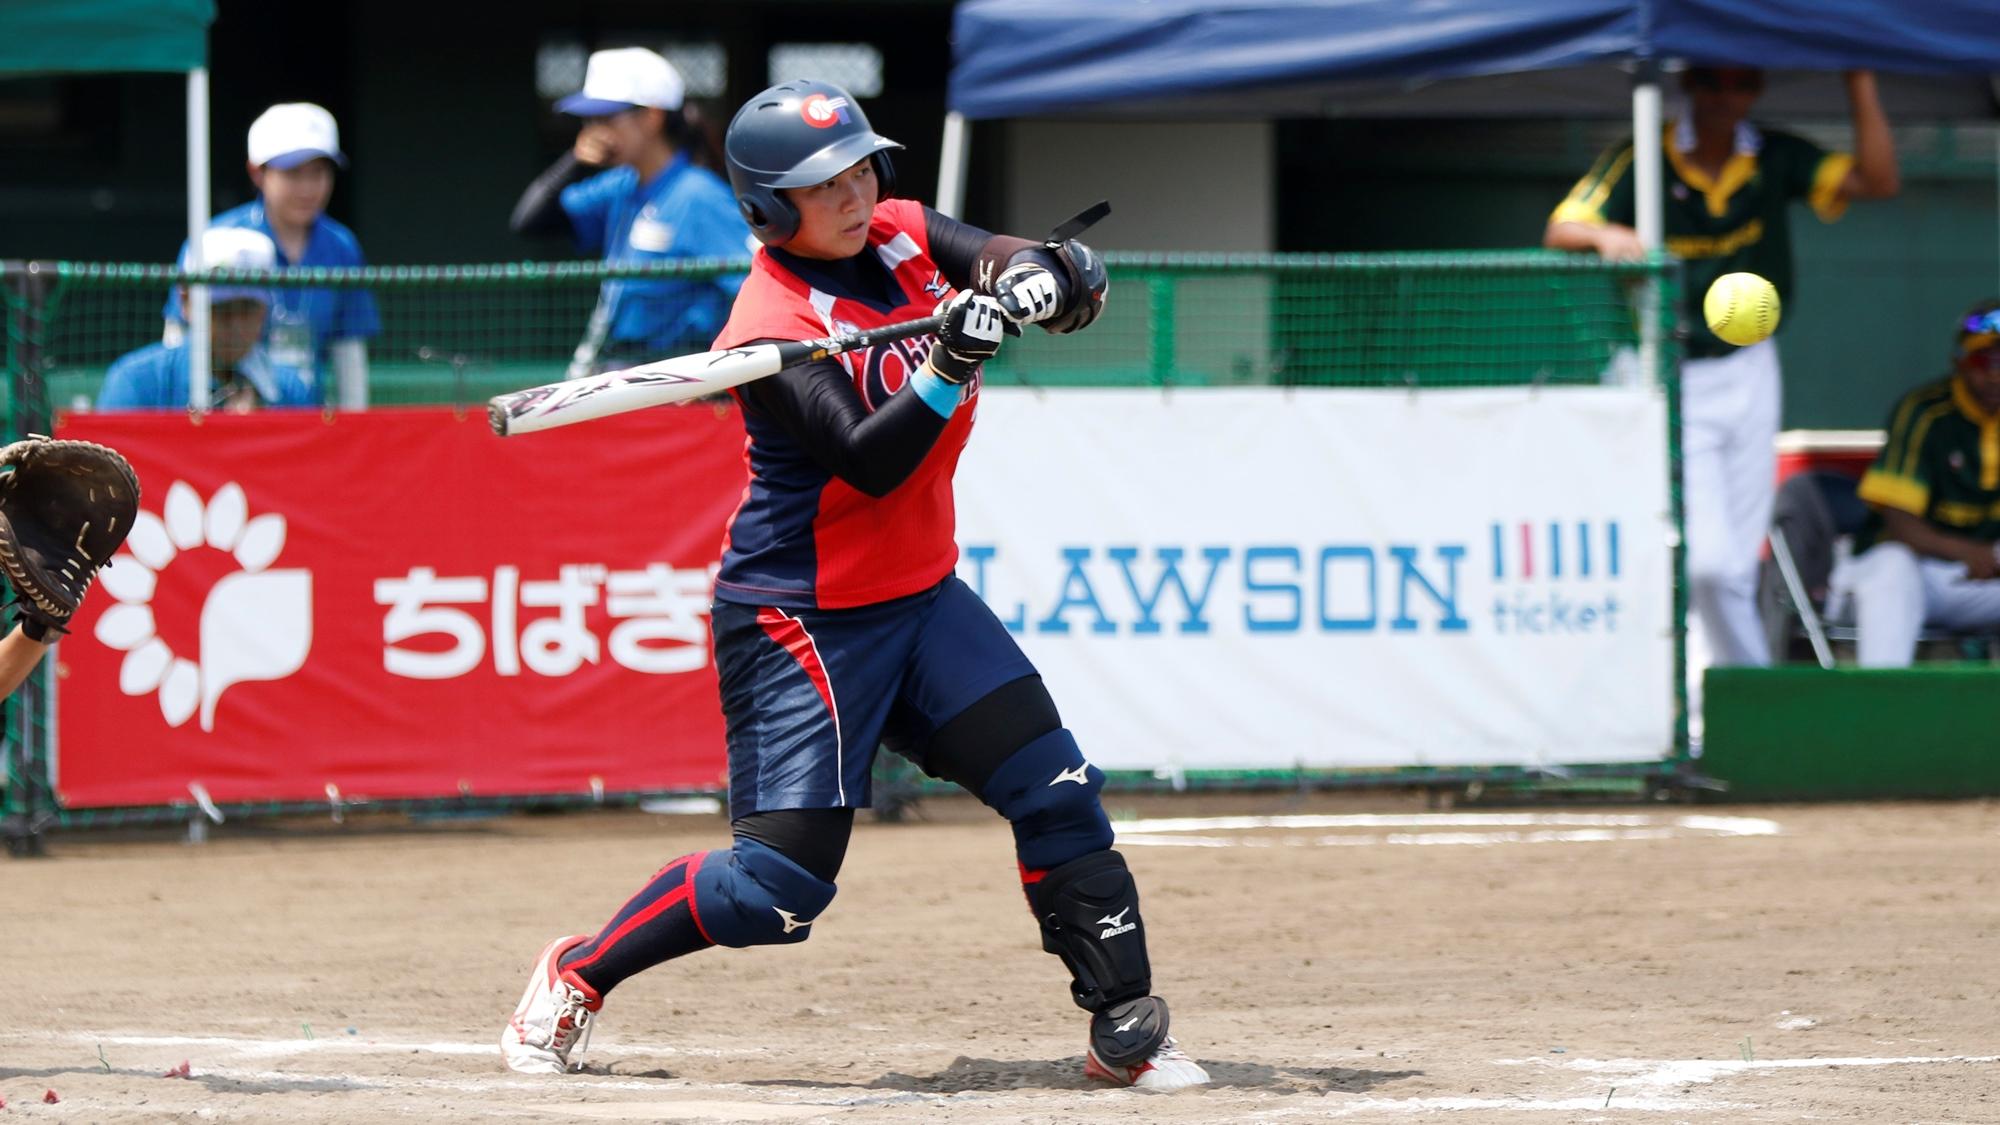 Su Yi Hsuan got one of the 3 home runs